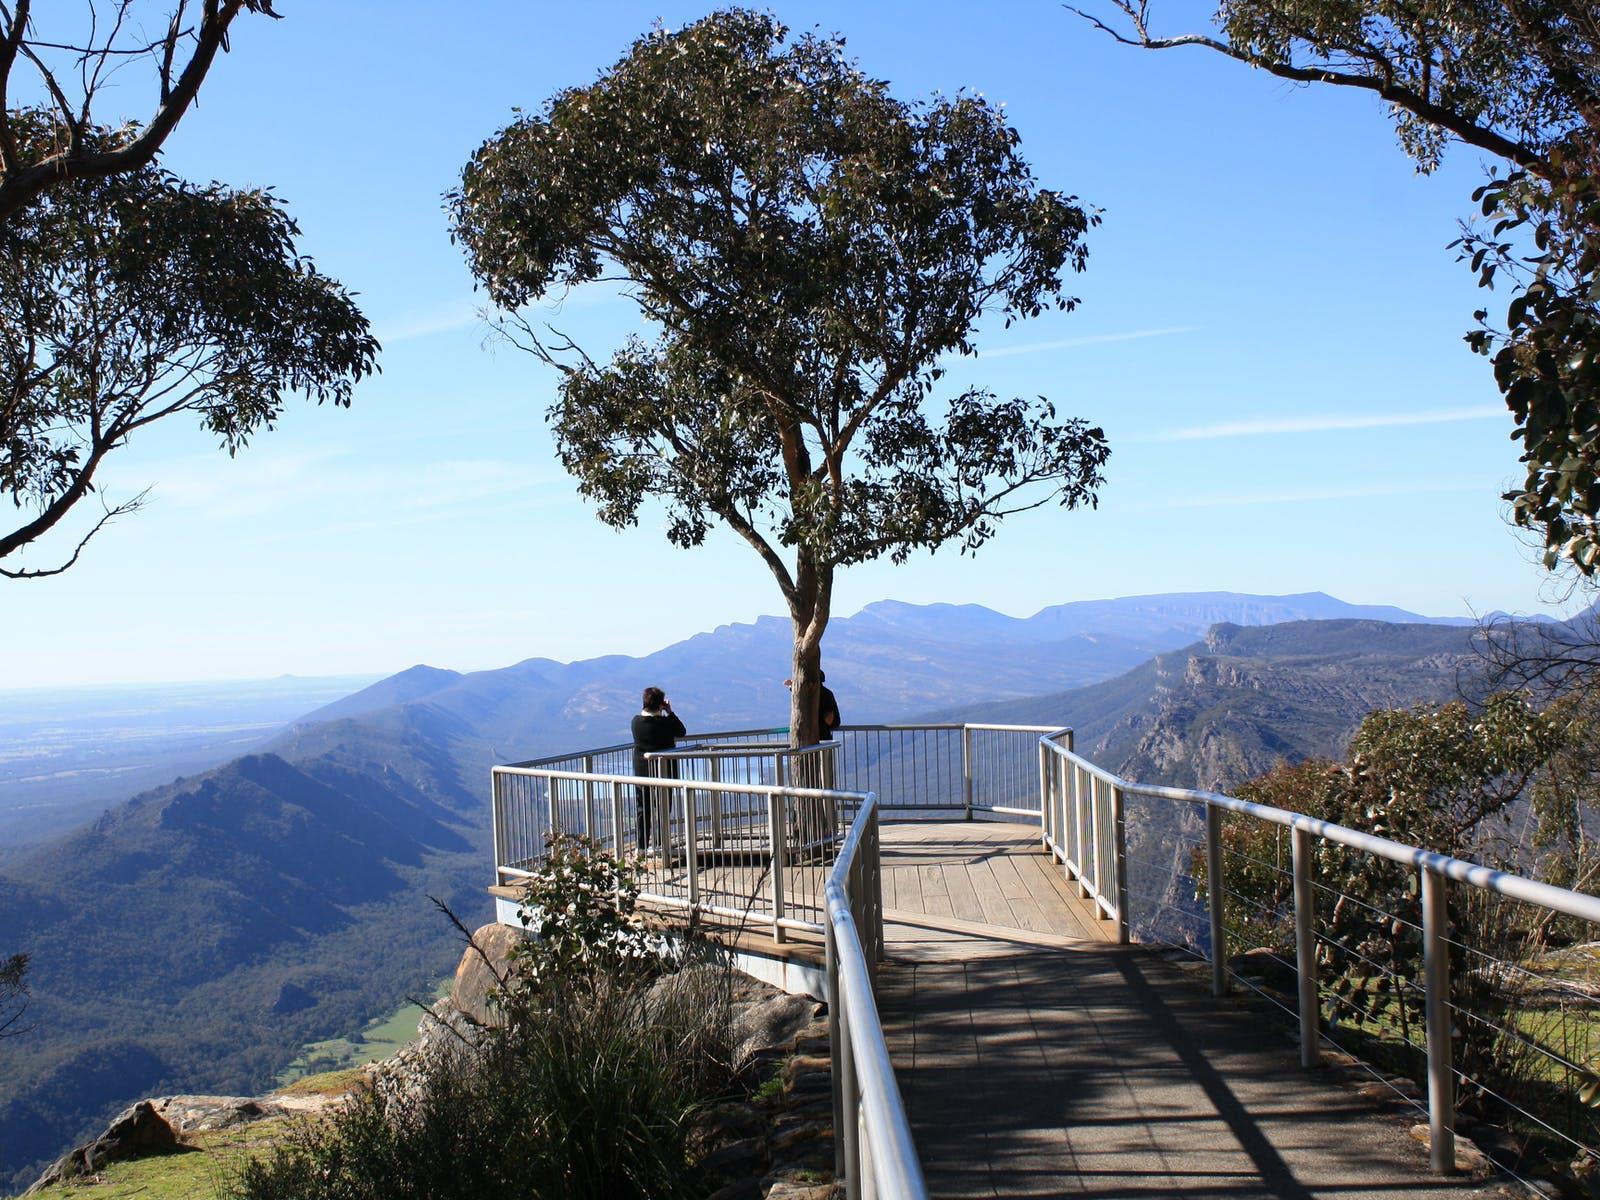 Boroka lookout, Grampians National Park